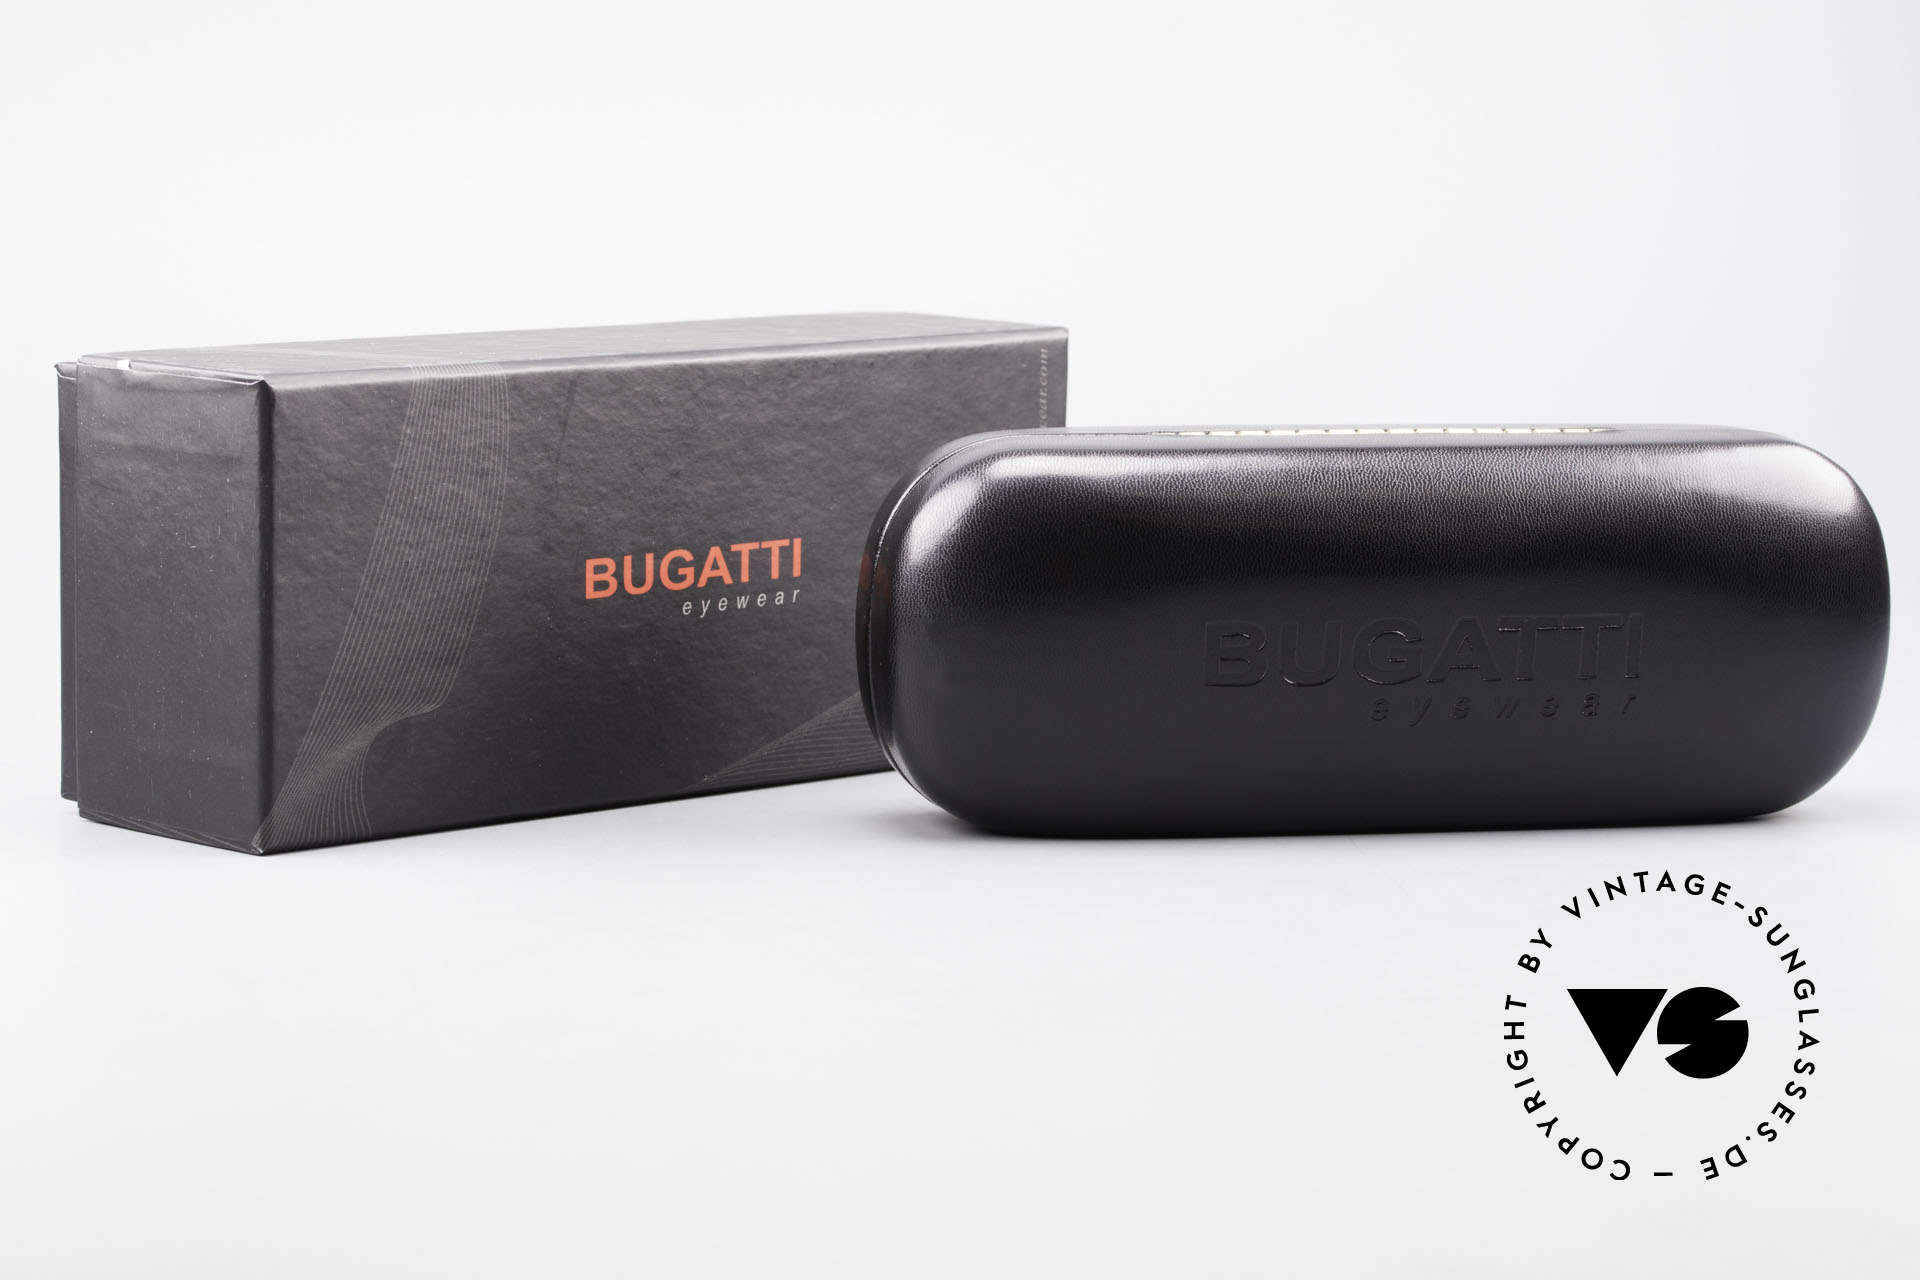 Bugatti 28108 Men's Reading Frame Bicolor, Size: medium, Made for Men